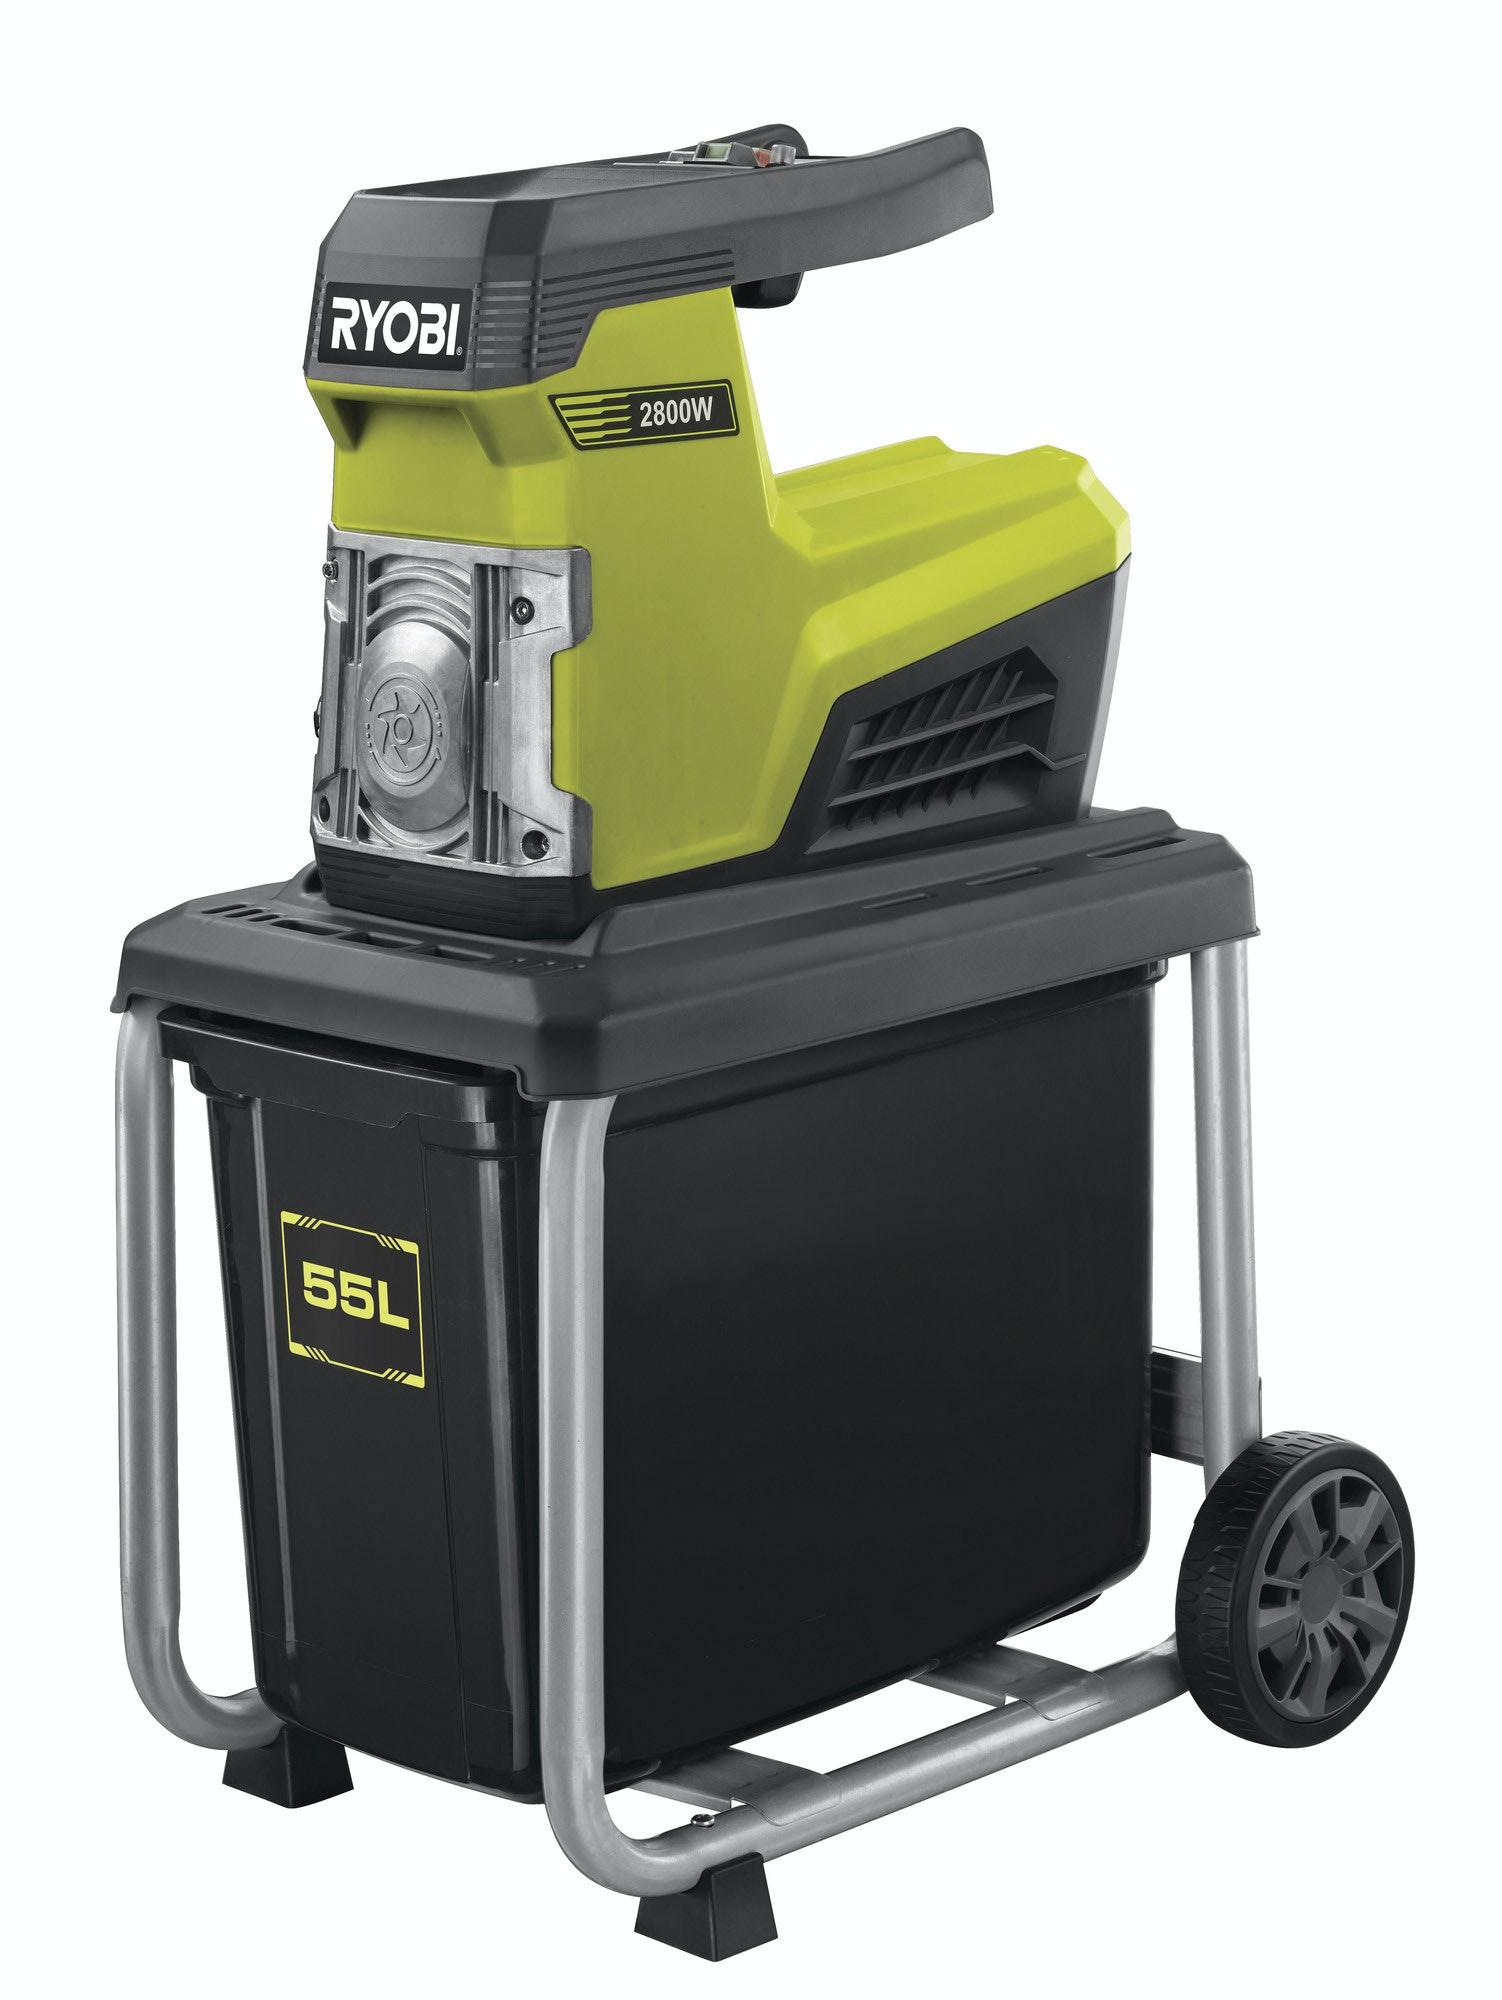 Kompostkvarn Ryobi RSH2845T 2800W 45mm